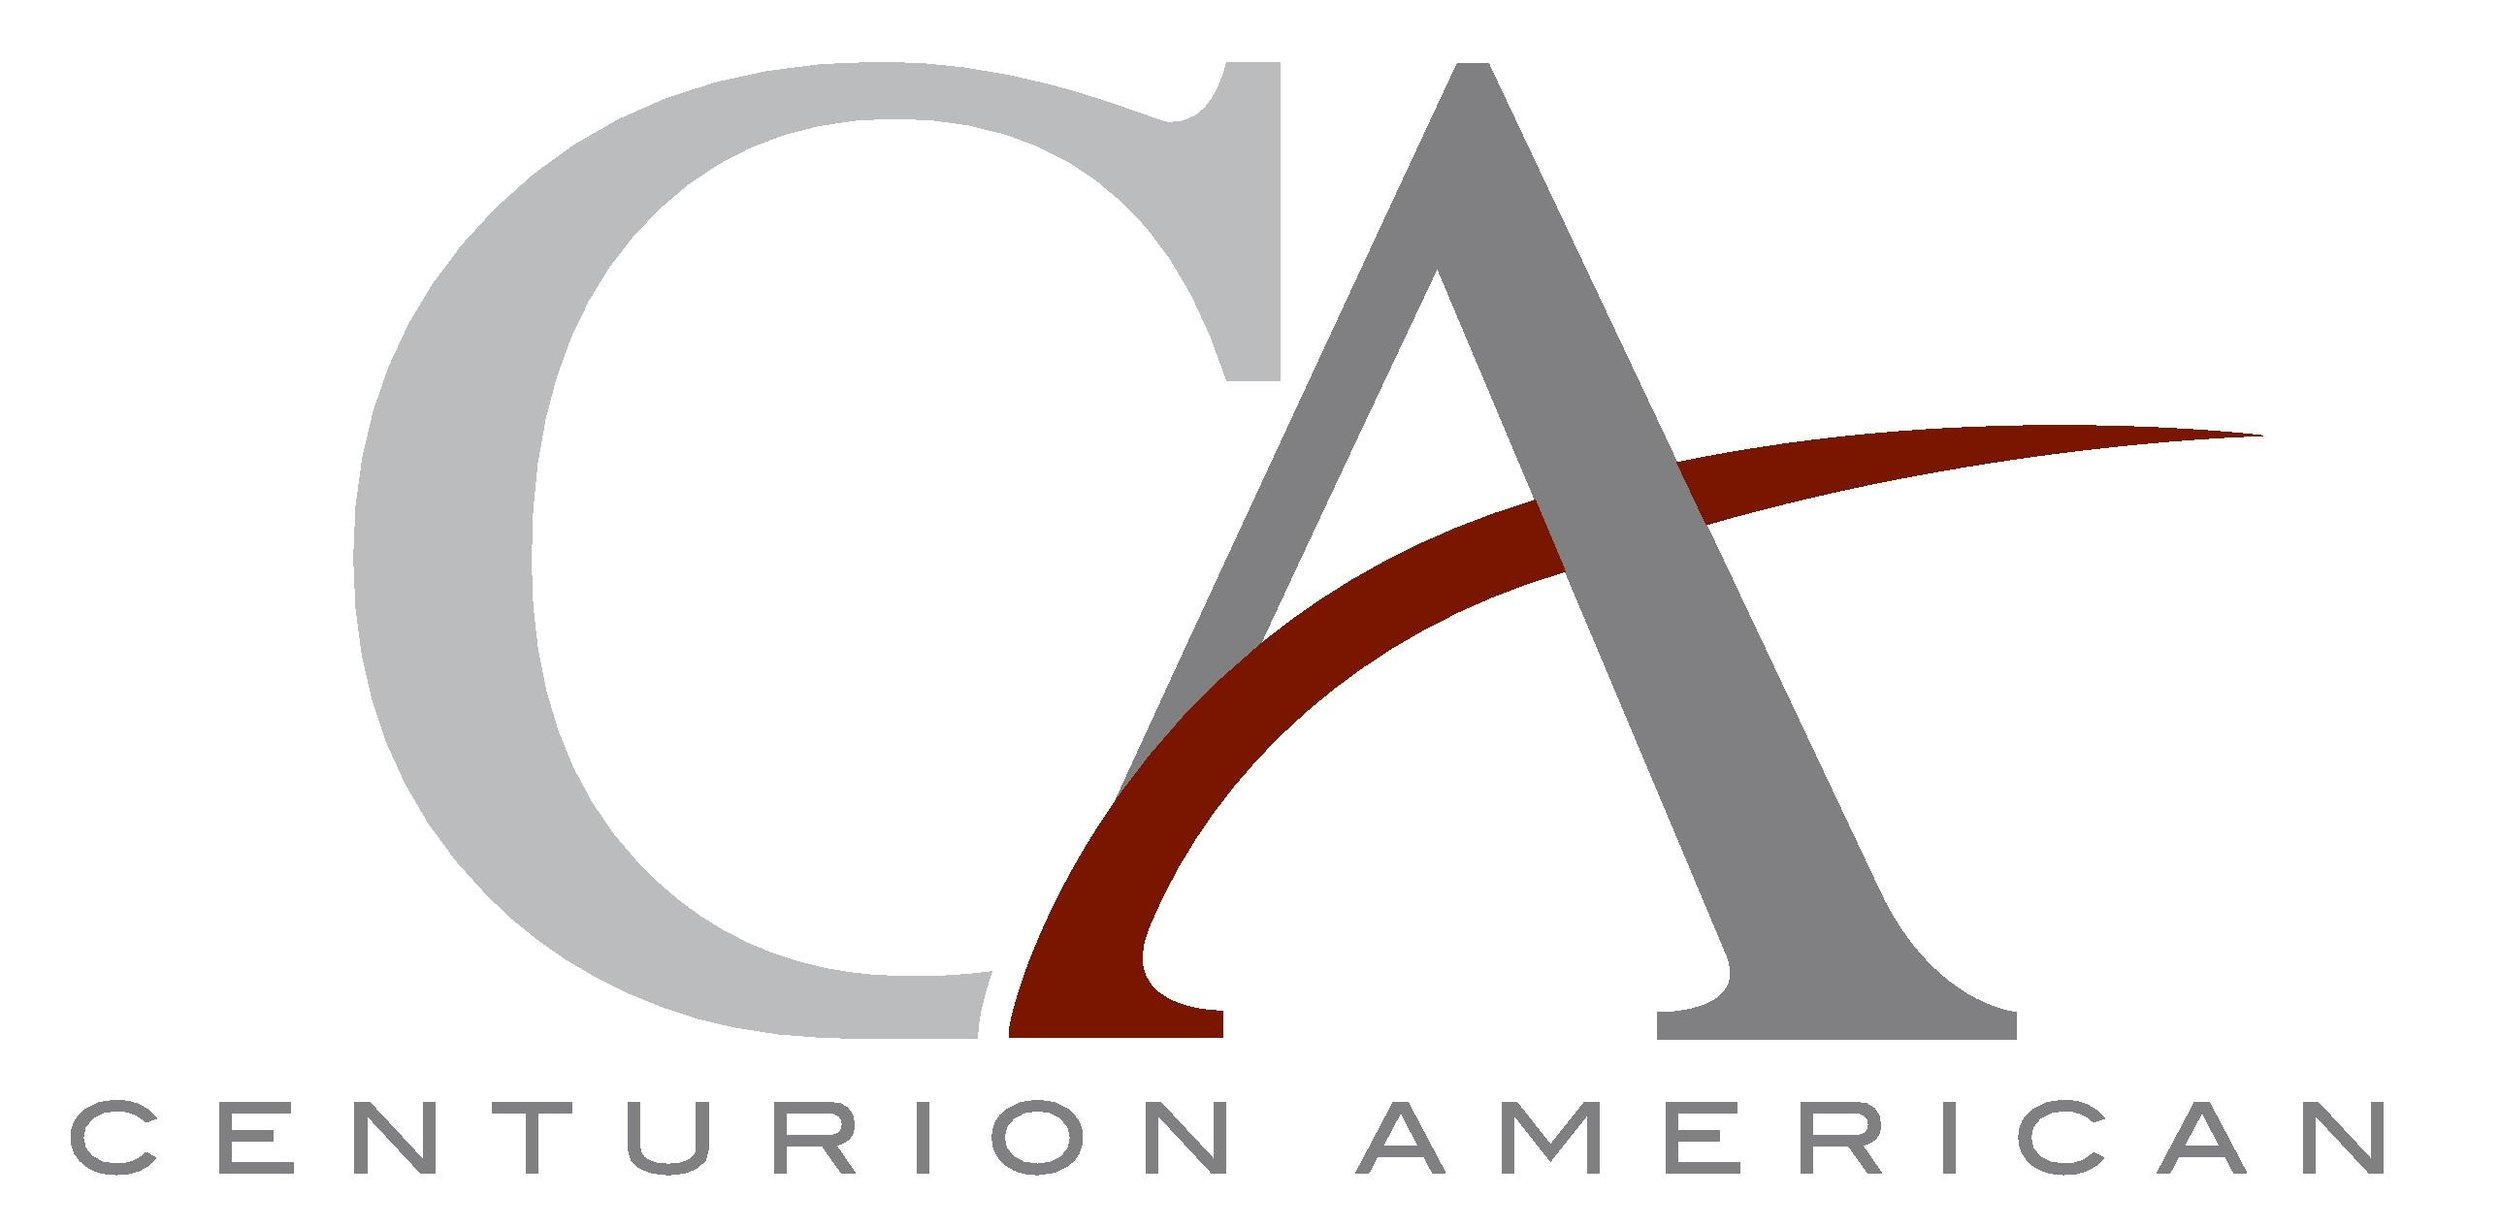 Centurion American.jpg